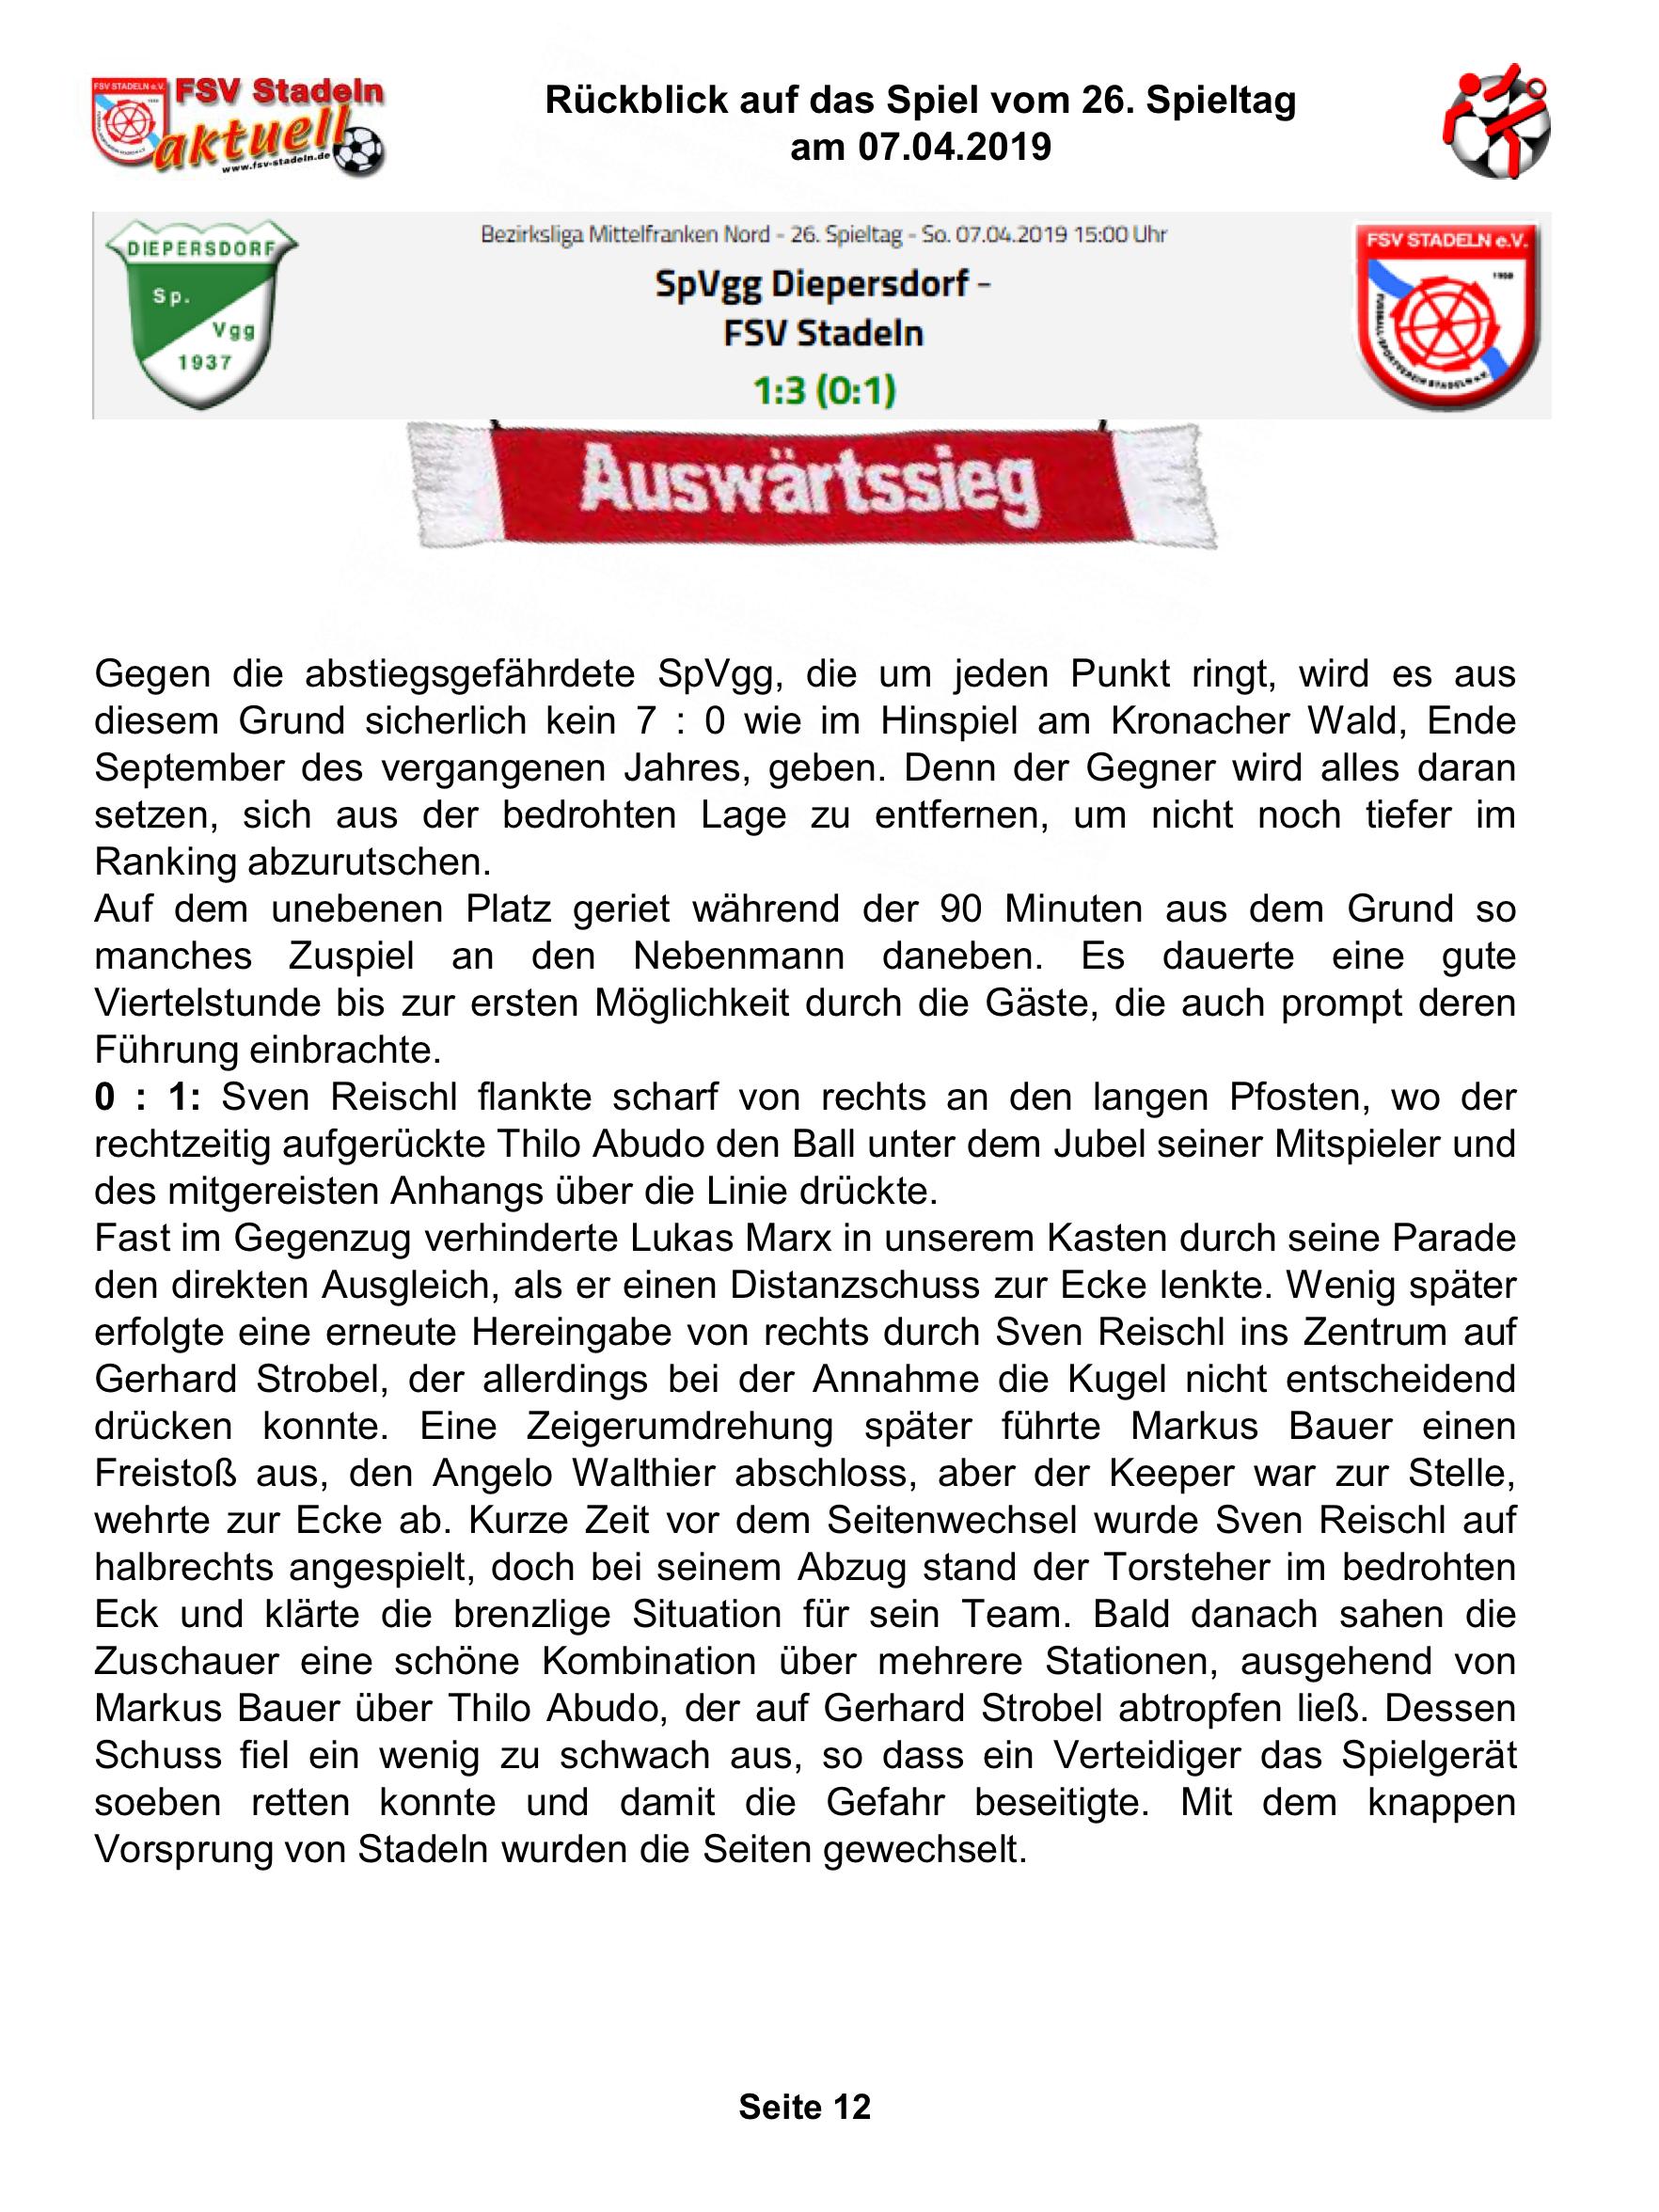 Hersbruck-12.png